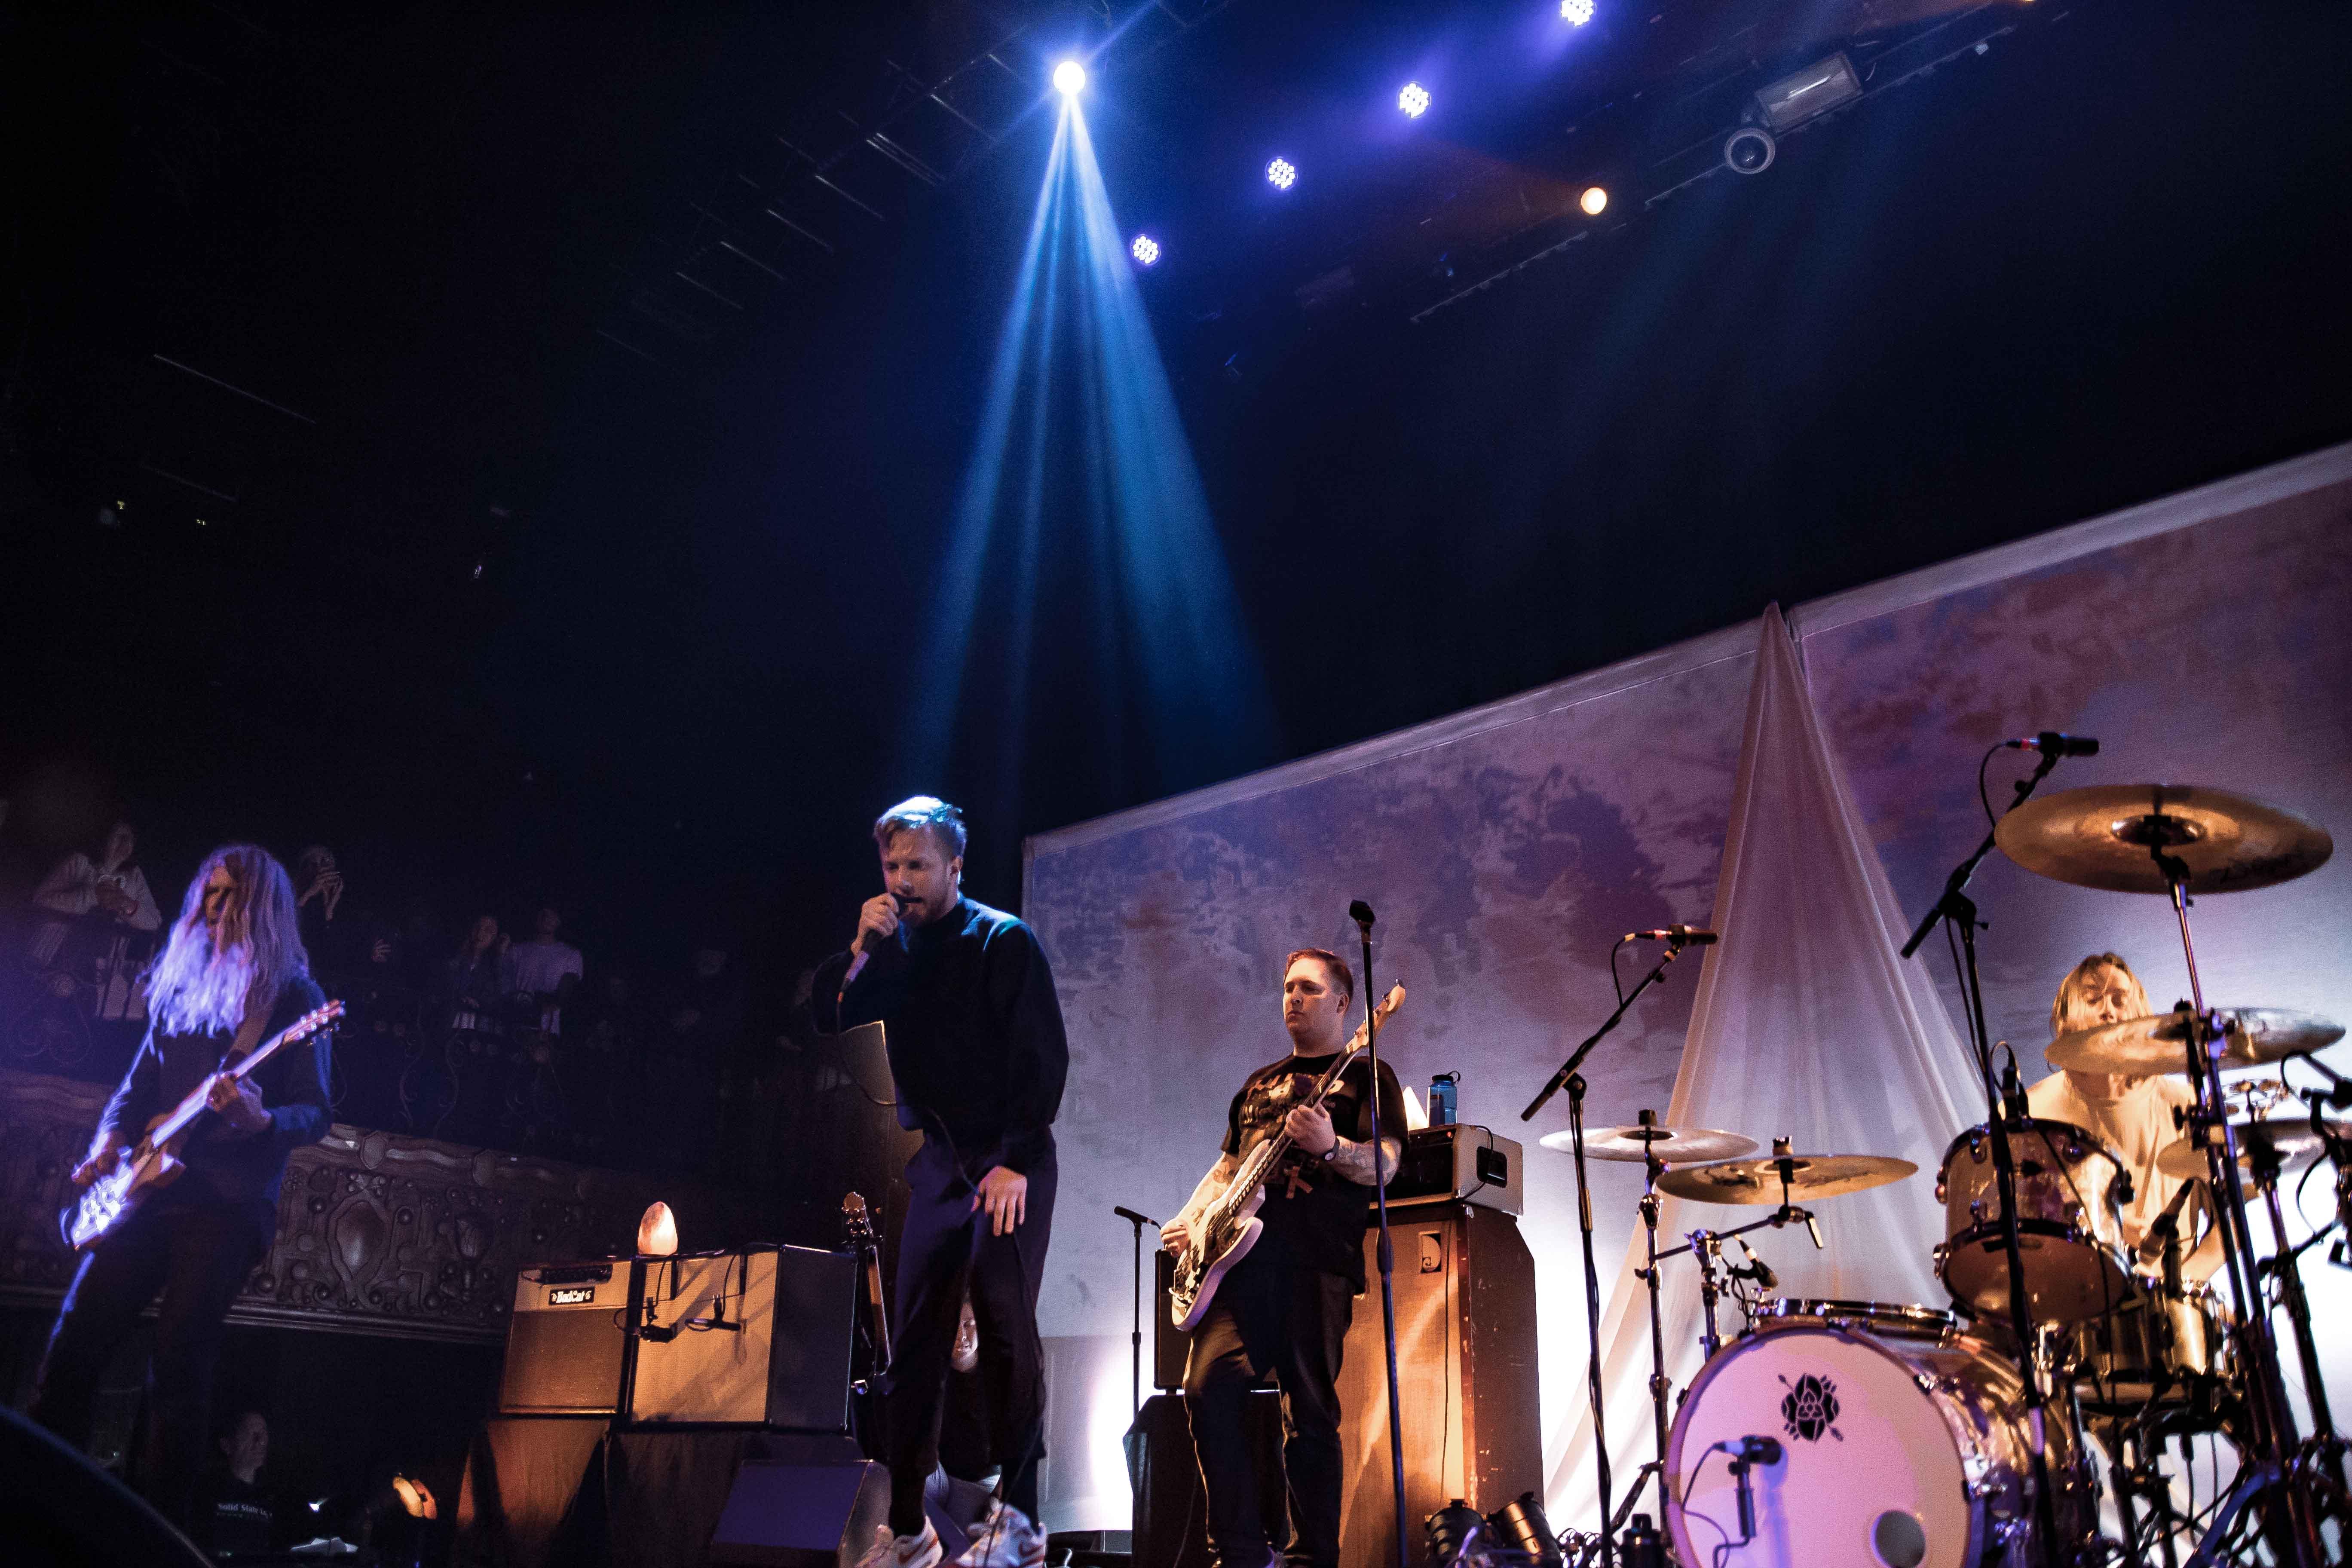 LaDispute-BelascoTheater-LosAngeles_CA-20191213-GinaBuban-9